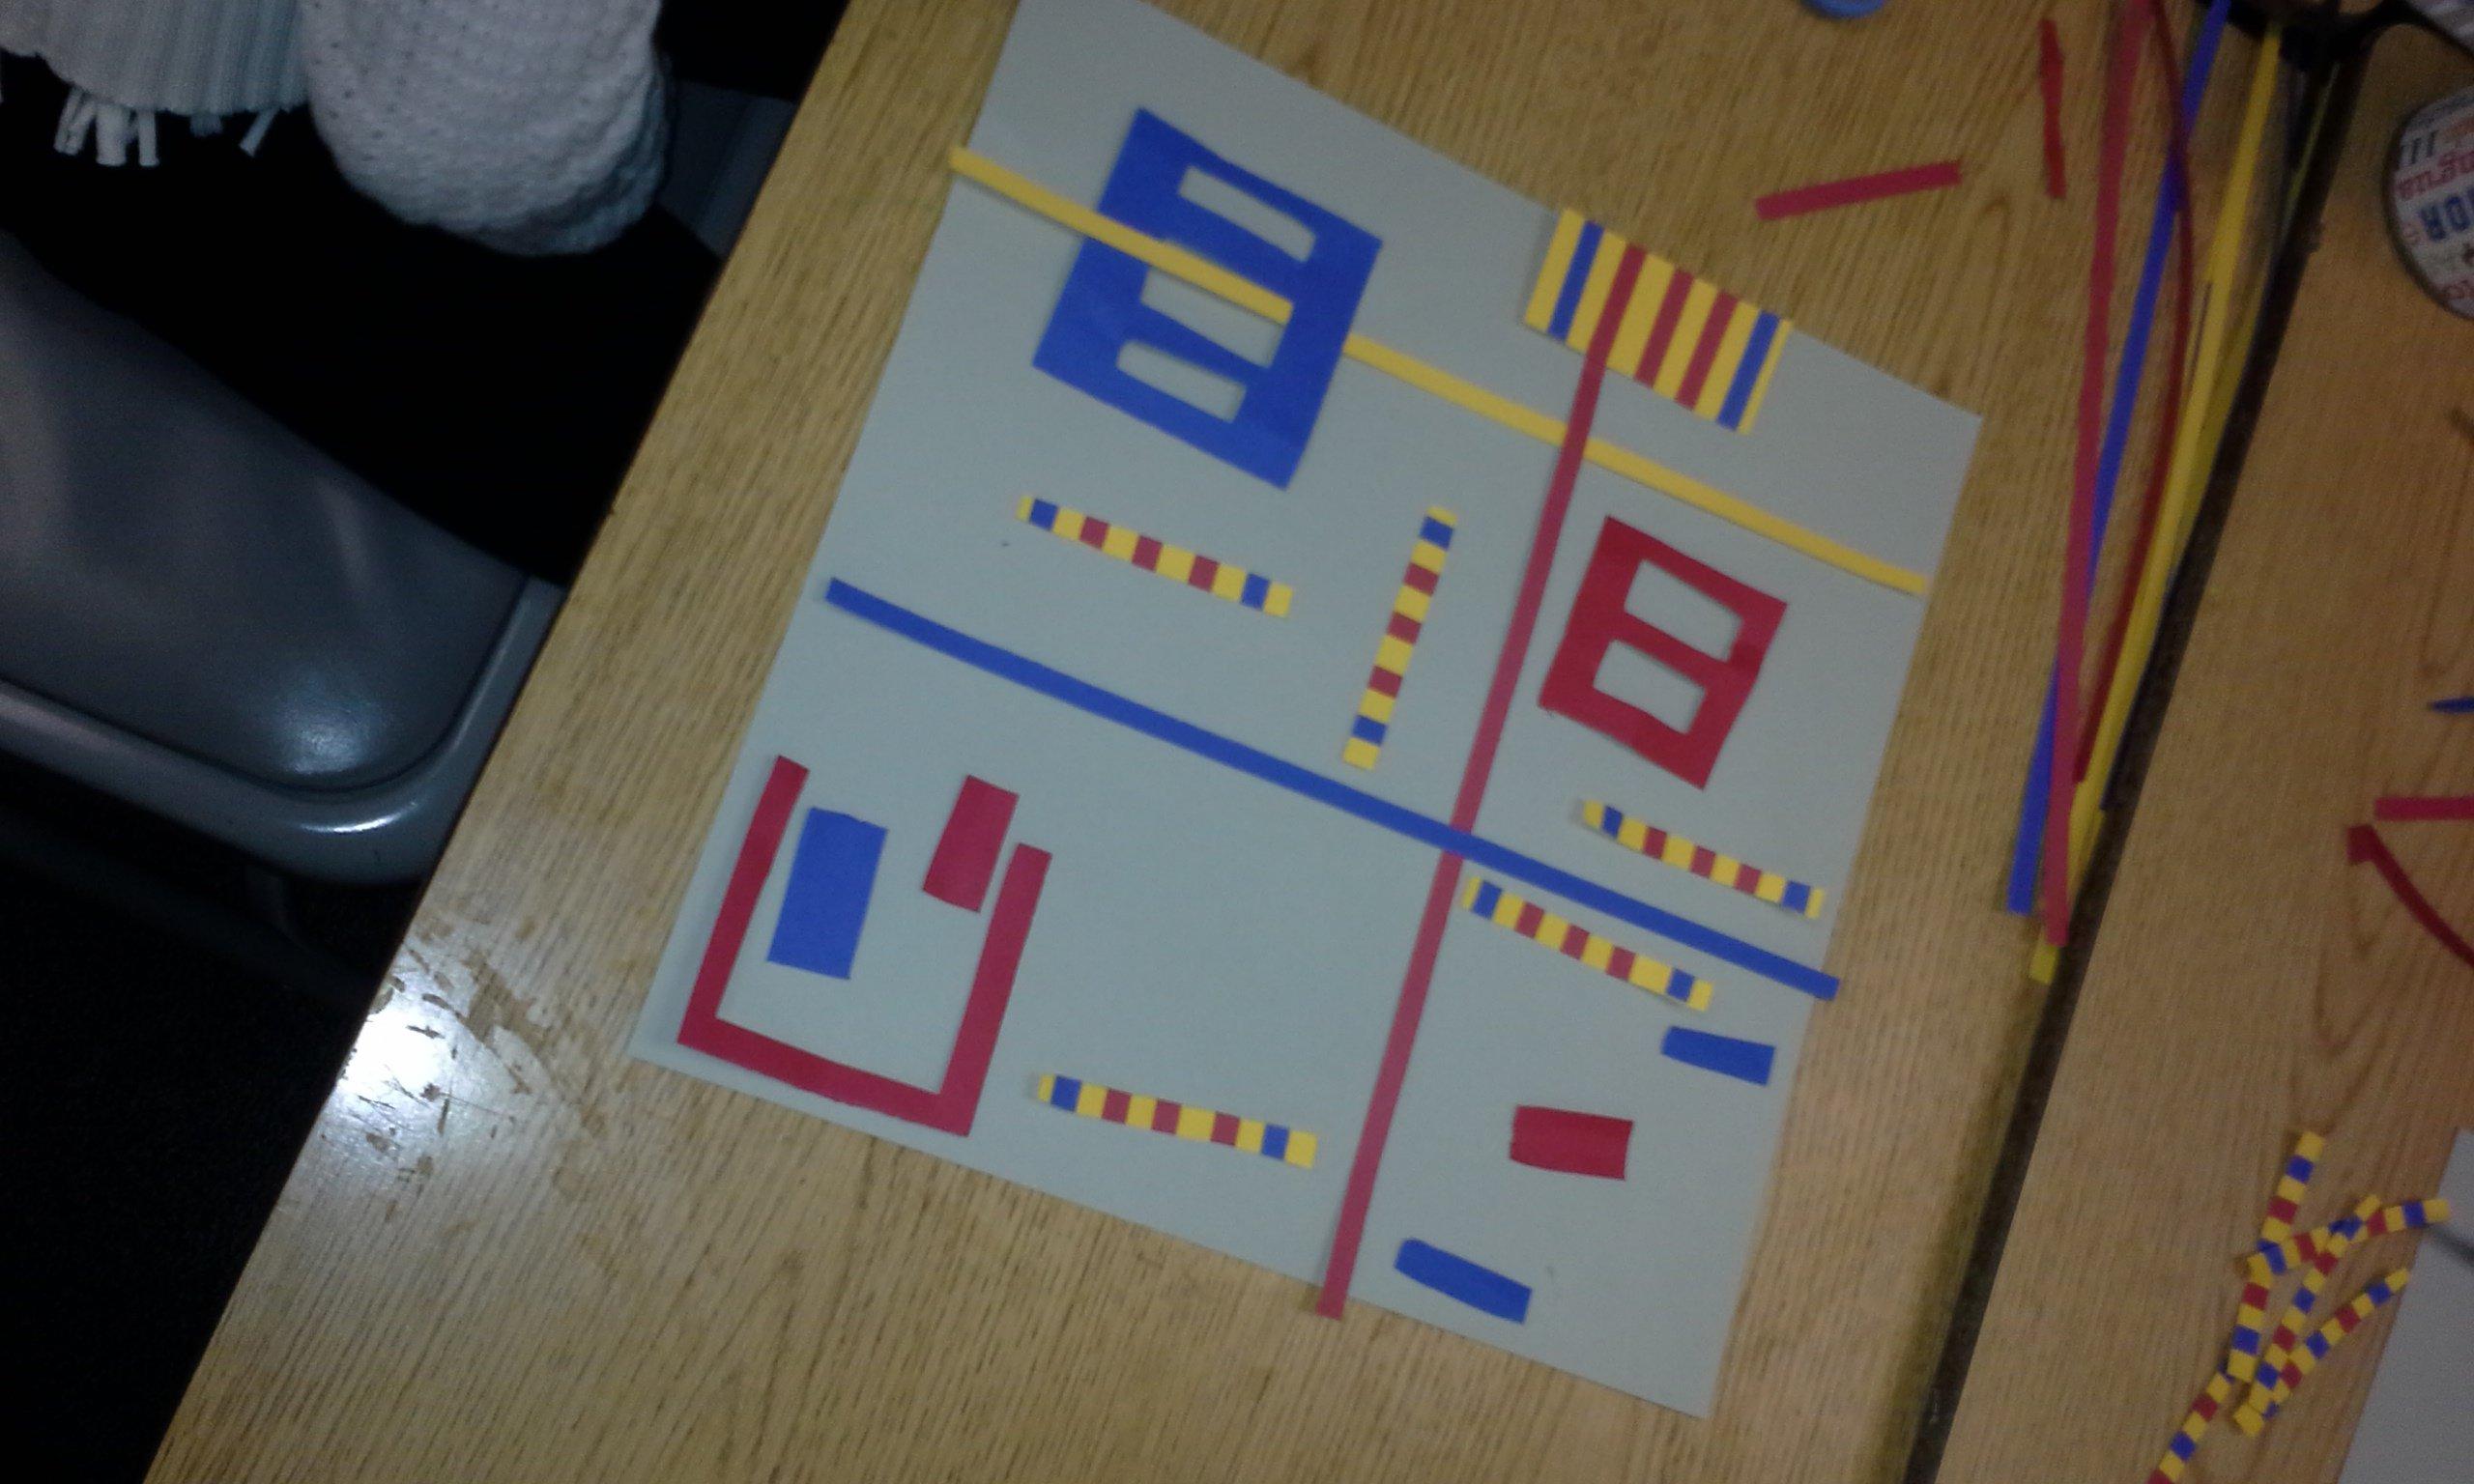 Meet The Masters Piet Mondrian Mondrian Type Balanced Compositions Art Activity